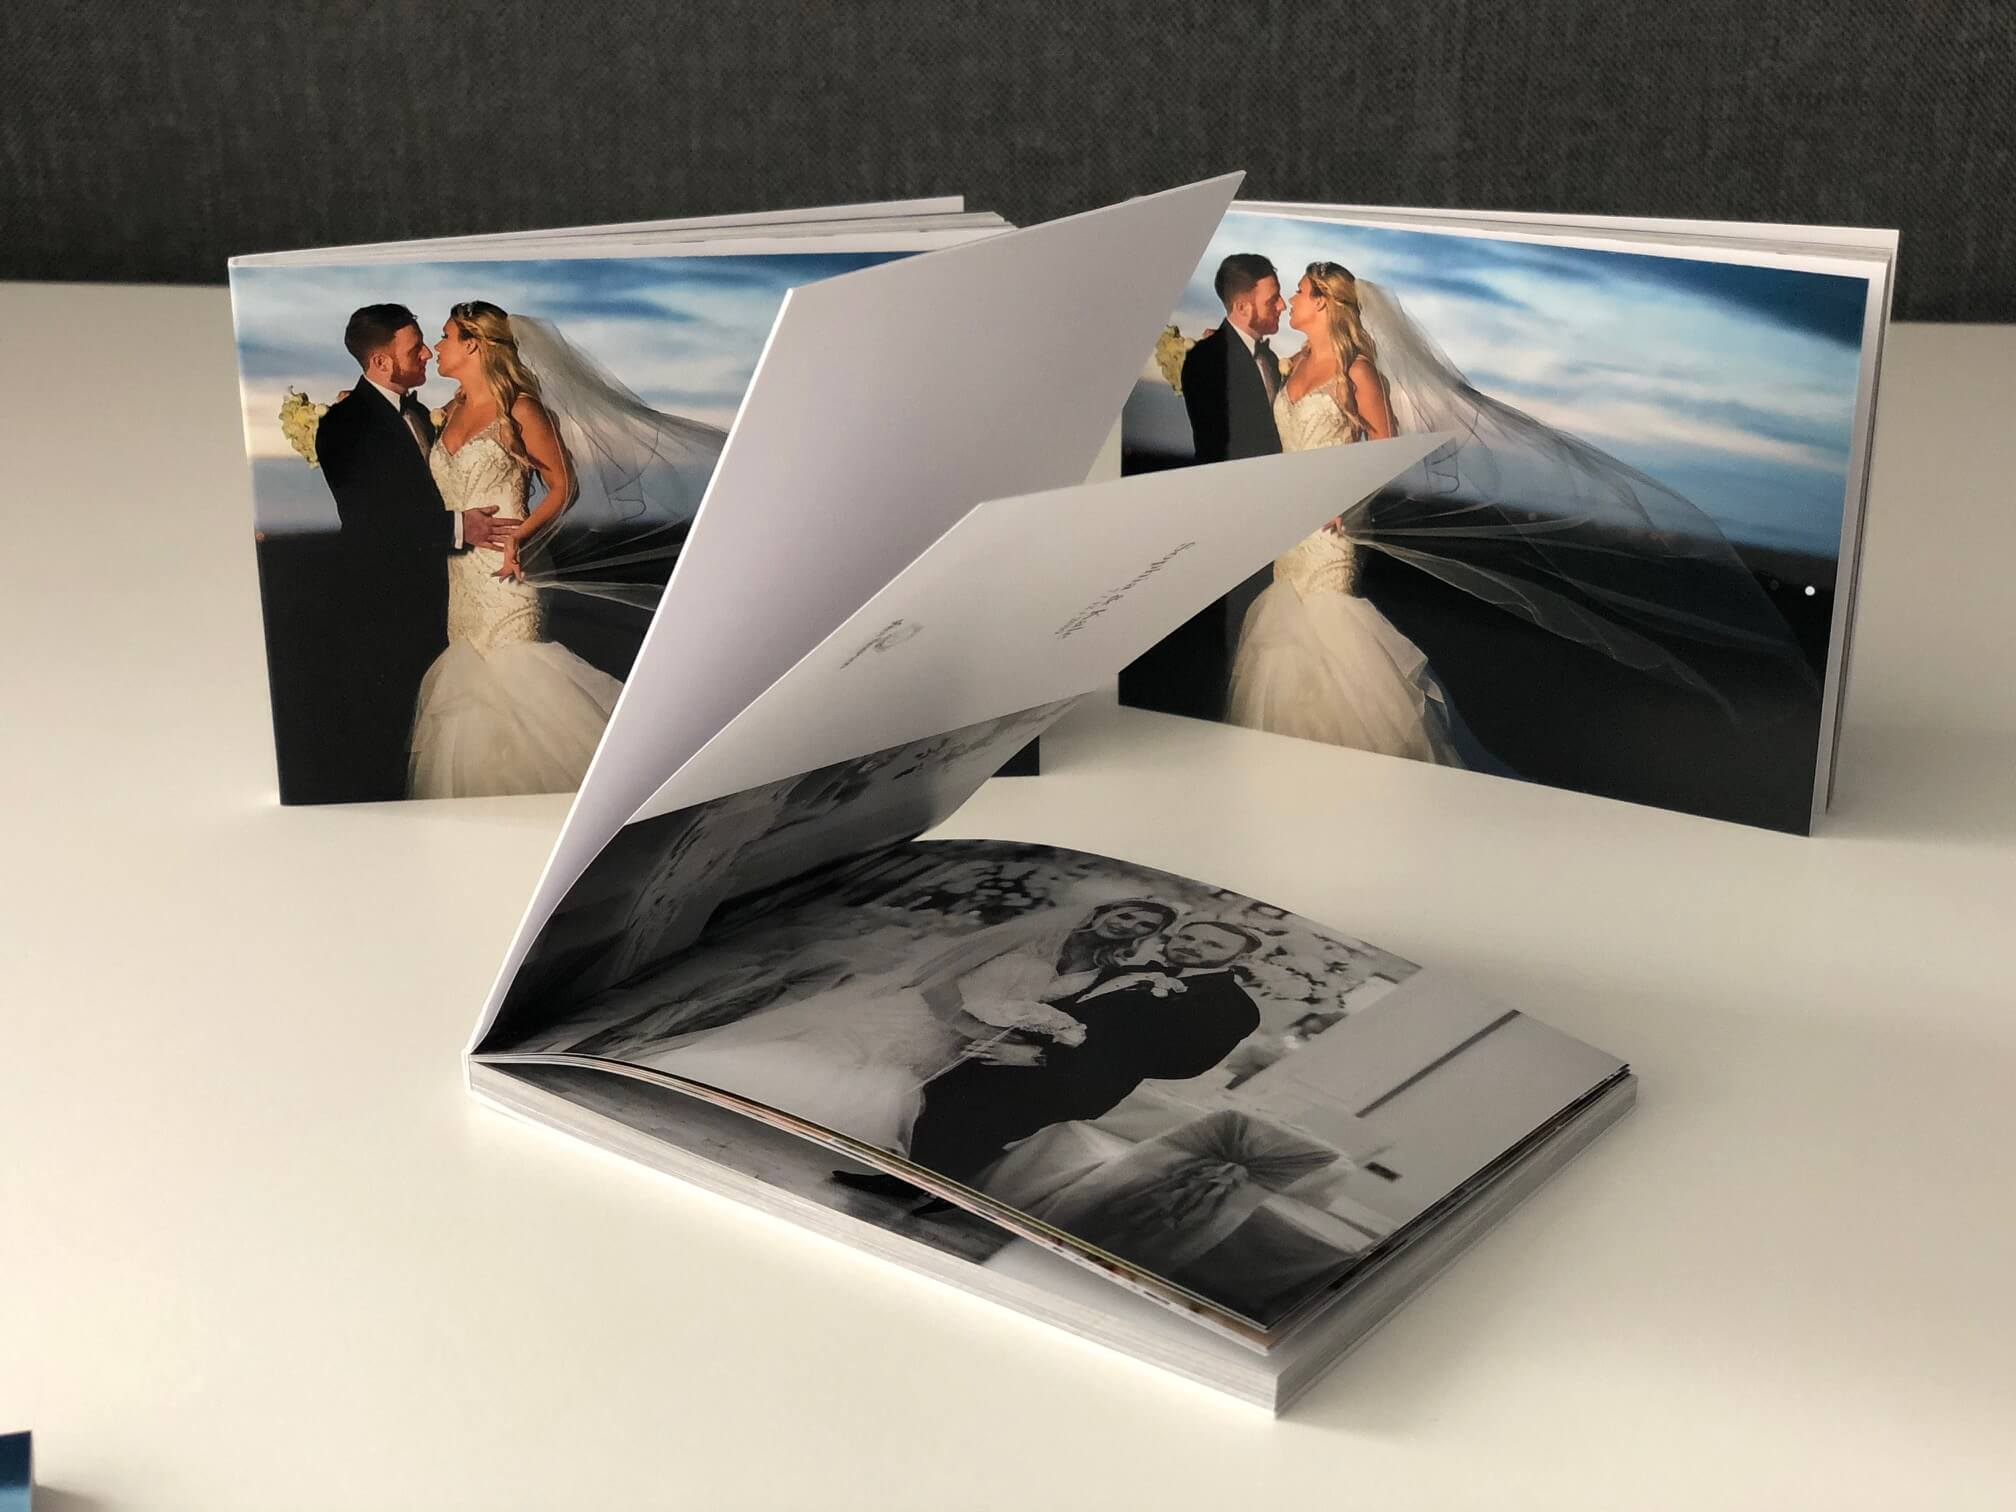 Storybook wedding album pocketbooks